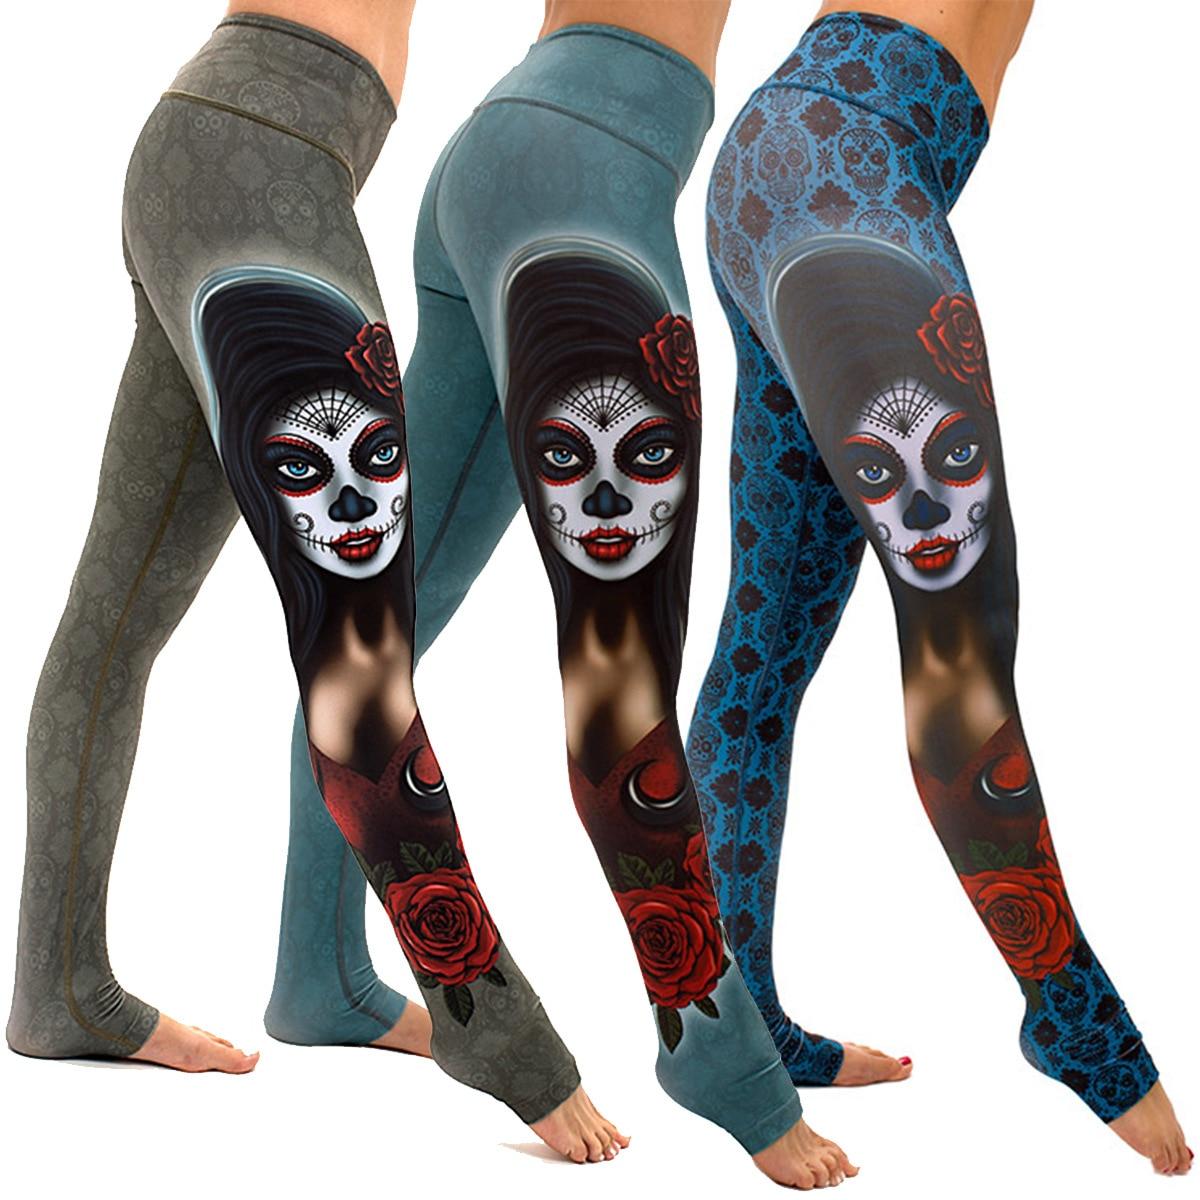 JIGERJOGER 2018 winter new High rise Women s Ghost Punk Skull face Leggings  3D print tight Yoga Legging Regular Size S M L XL-in Yoga Pants from Sports  ... 58d48d166bae